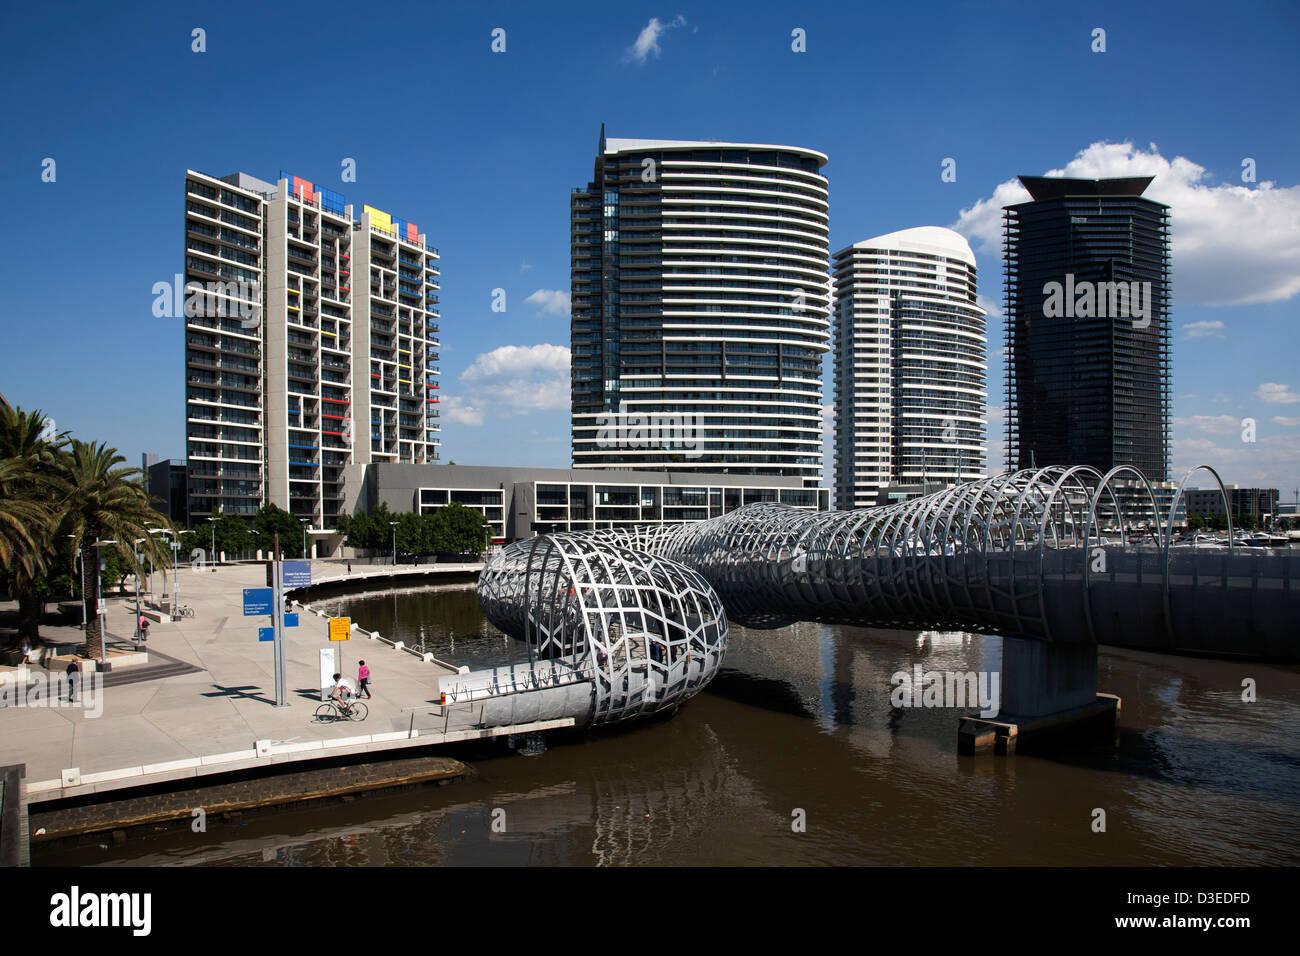 Pedestrian and cycleway Webb Bridge at Victoria Harbour Docklands Melbourne Victoria Australia - Stock Image